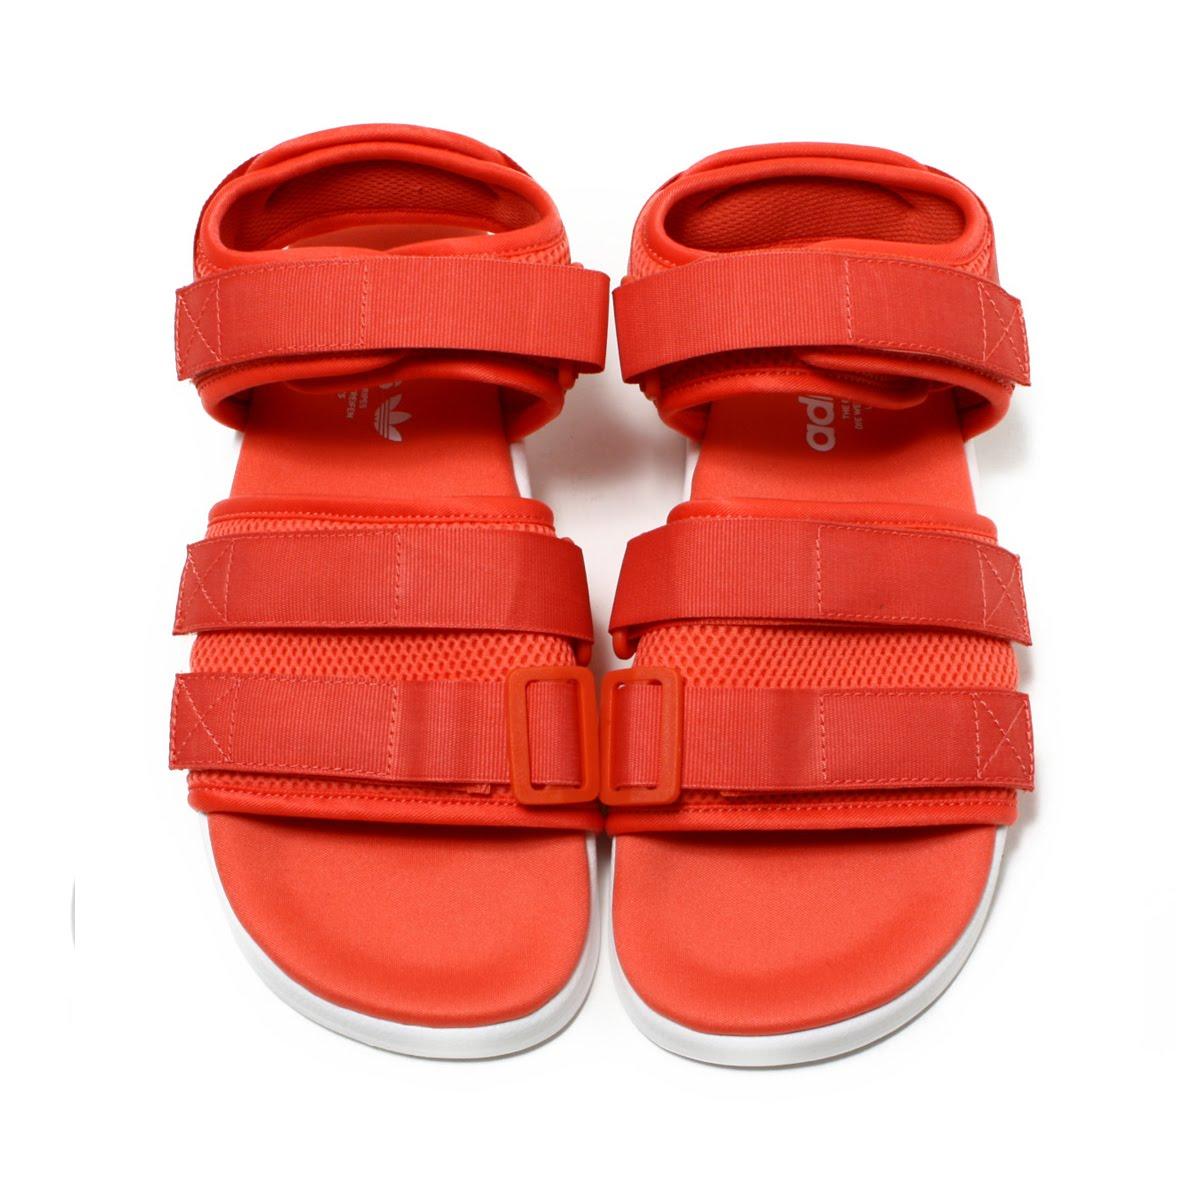 c89aed1970dd adidas Originals Adilette Sandal 2.0W (Adidas originals N M D R1STLT PK W)  Trace Scarlet Running White Running White 18FW-I